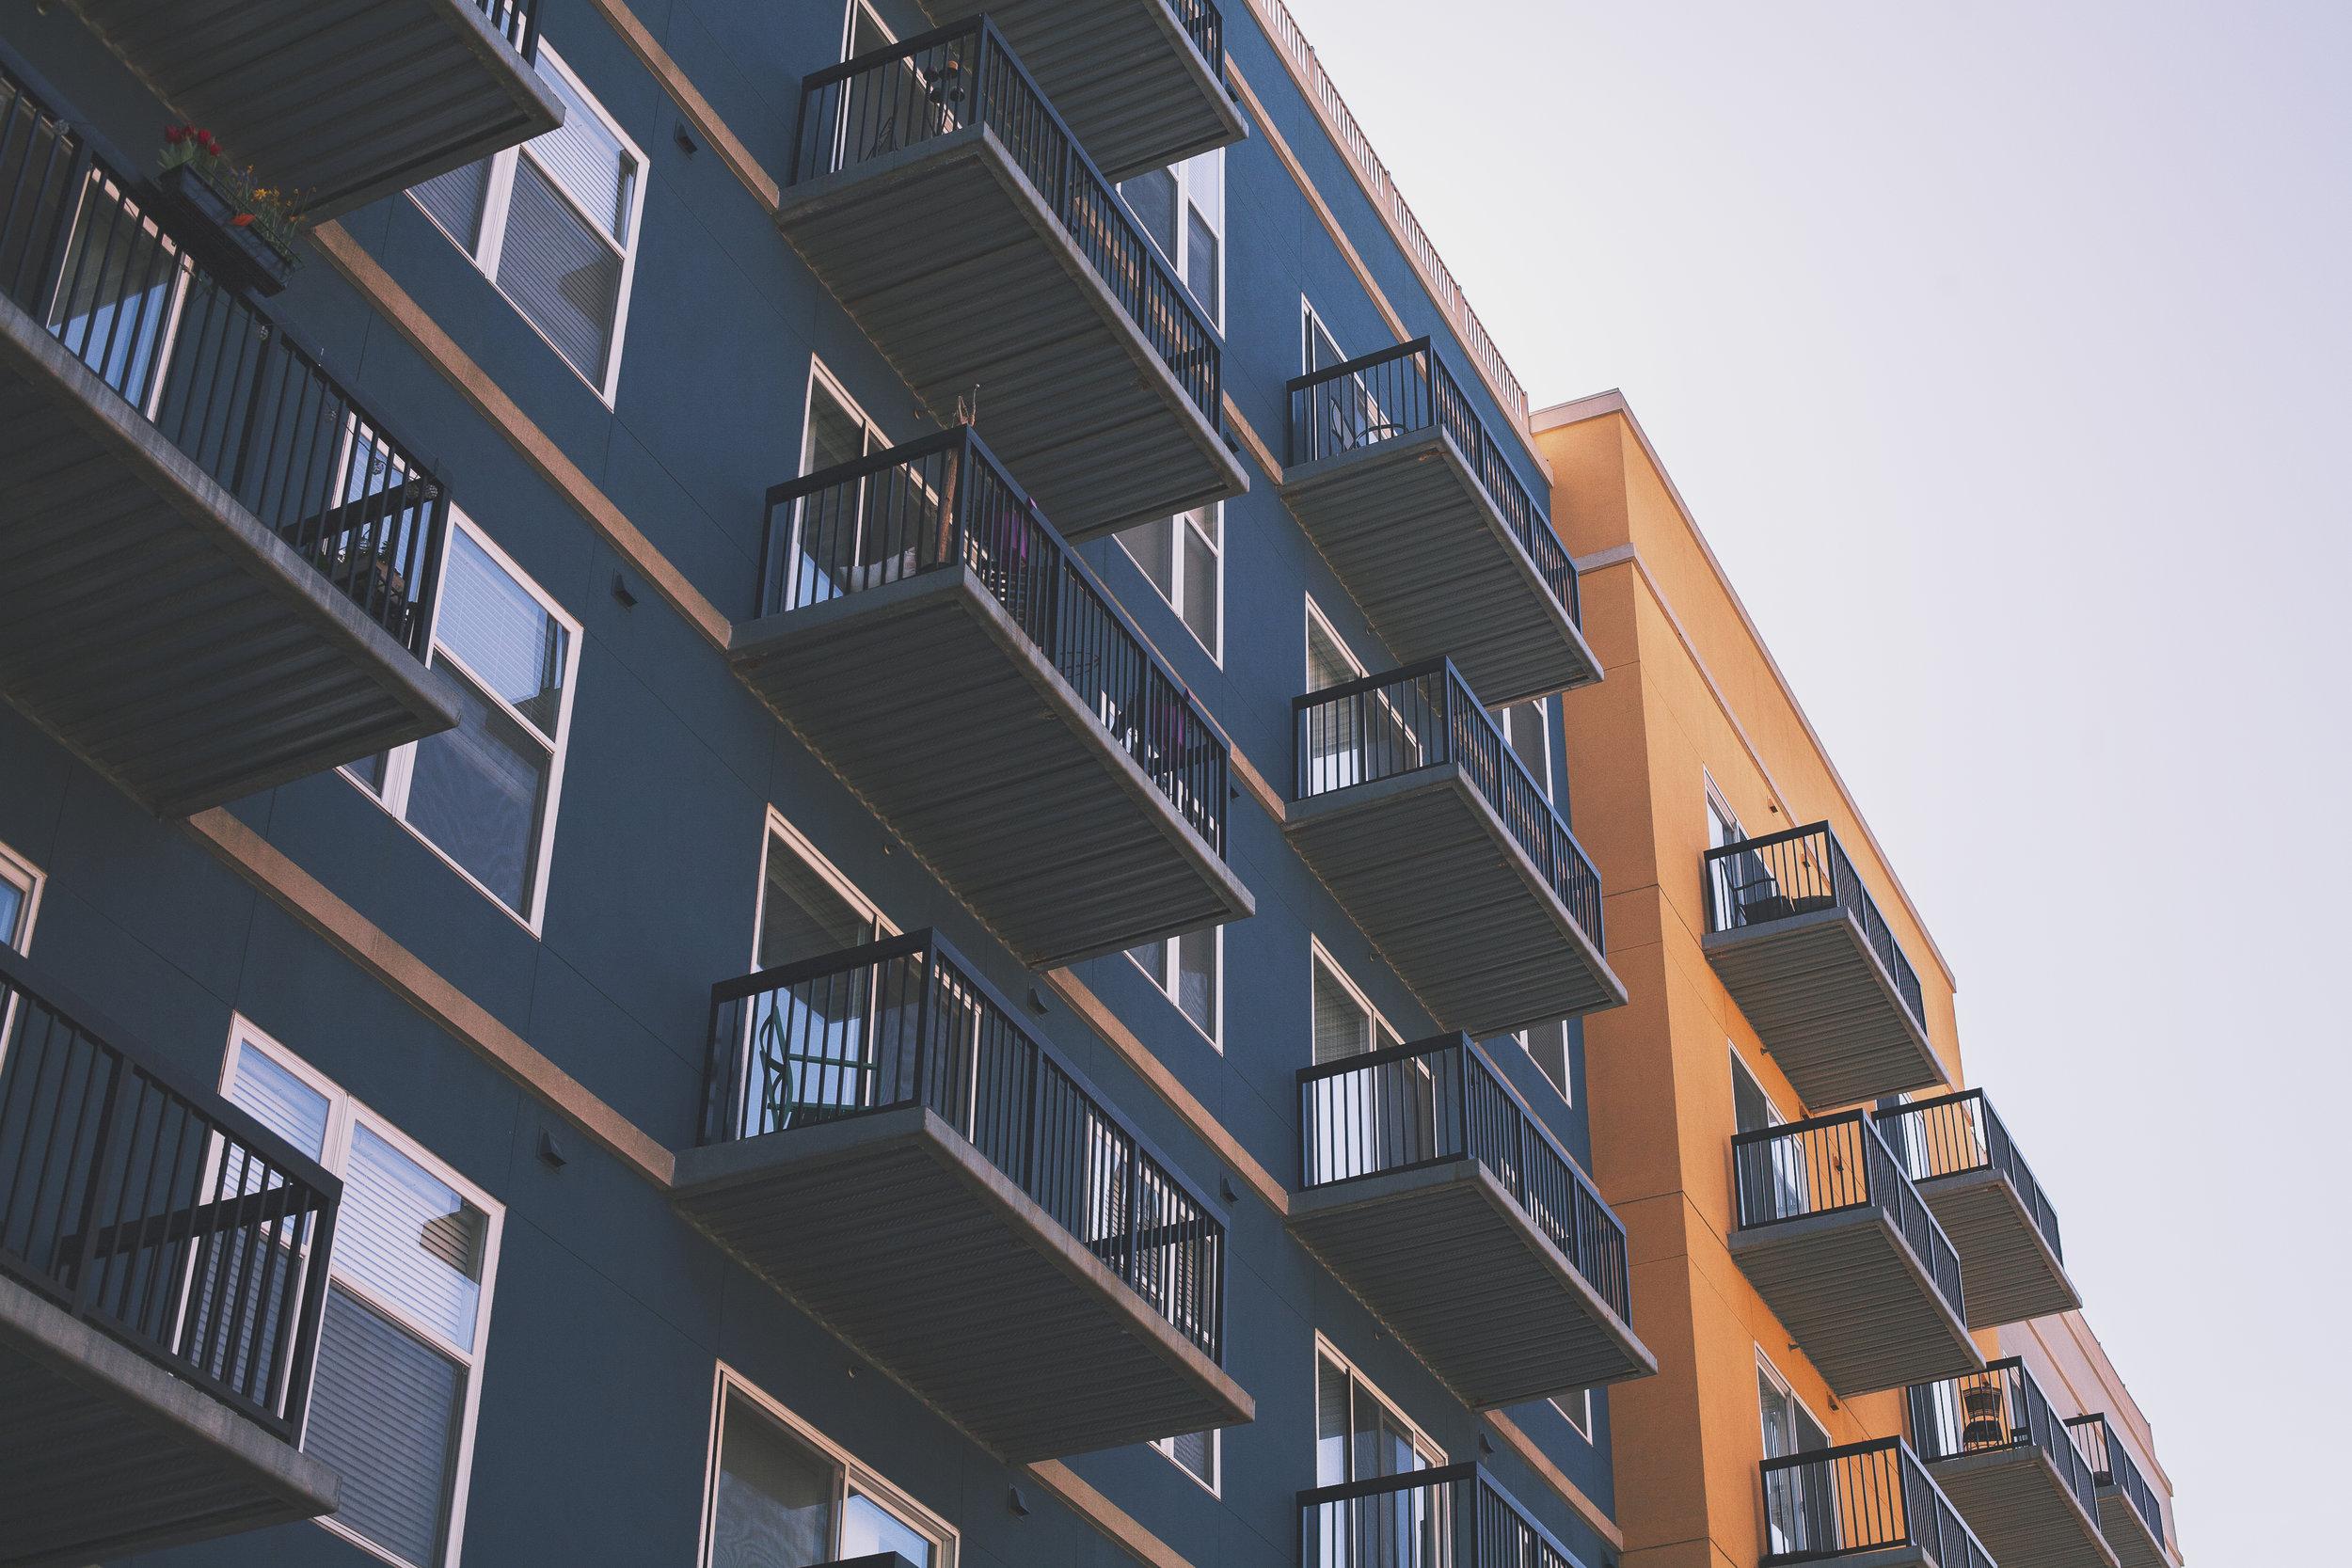 Georgia Peach Apartments - Residential Lofts & Living Apartments